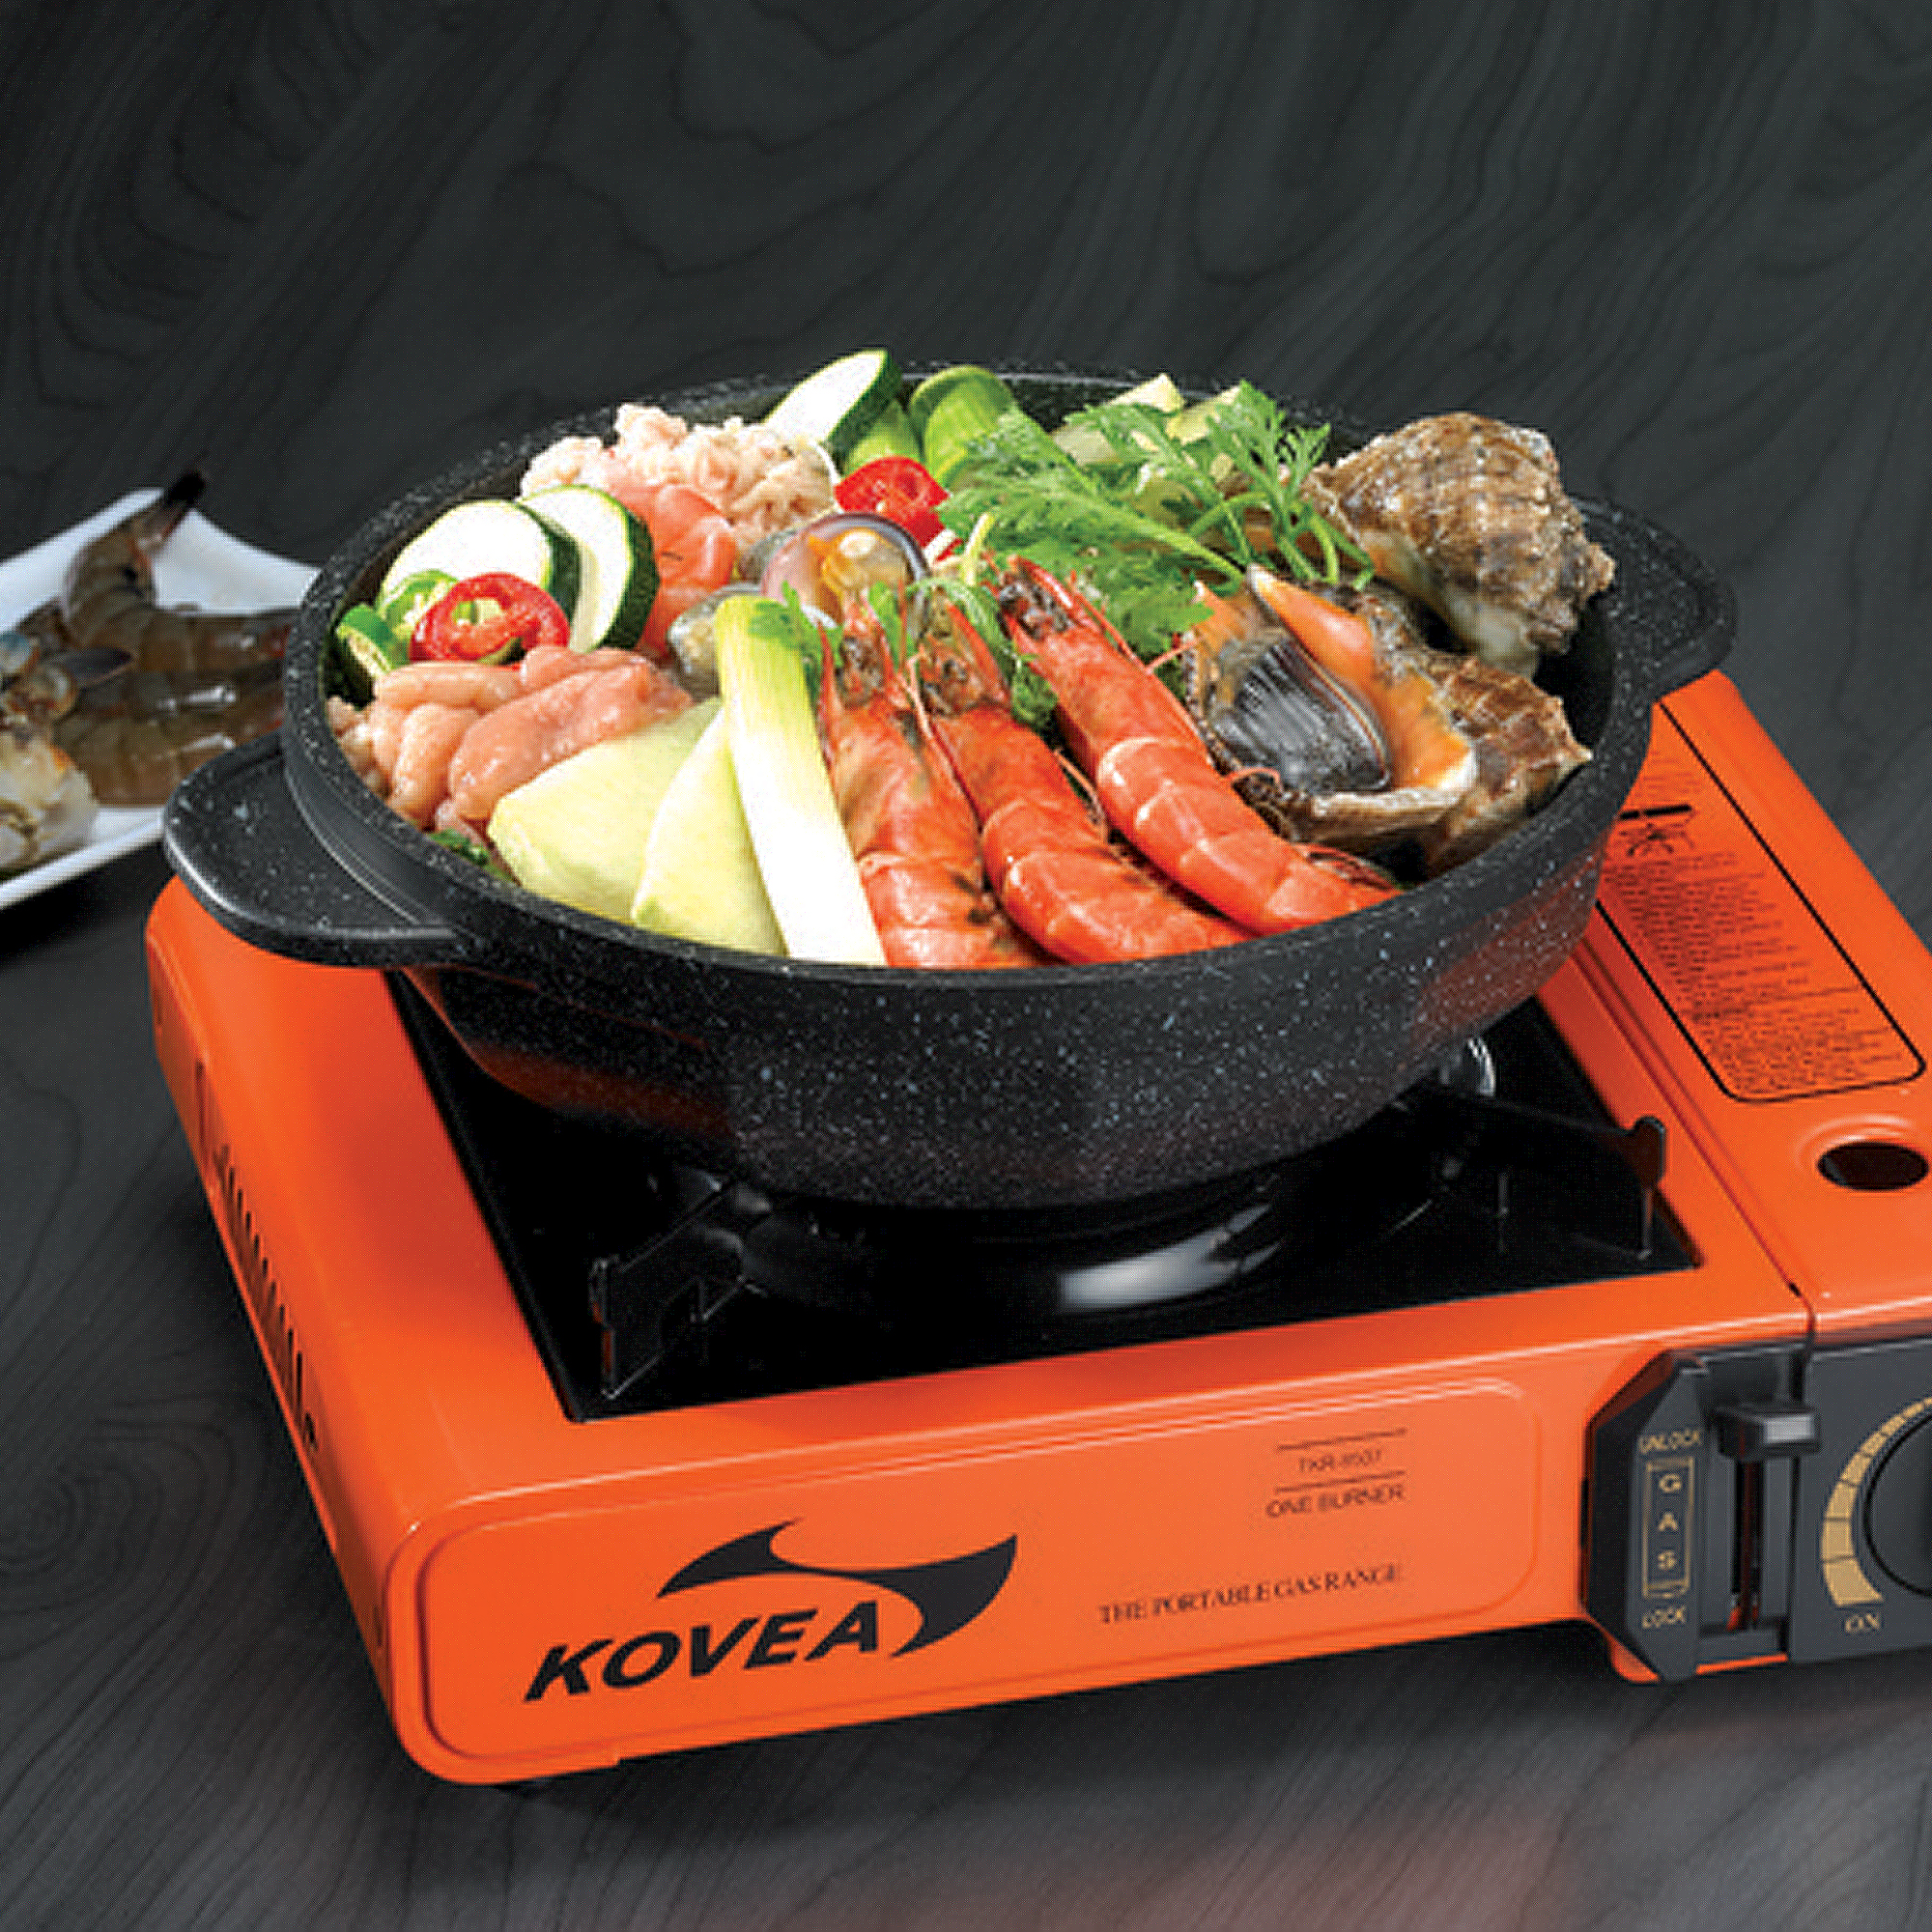 Фото 2 - Газовая плита Kovea Portable Range TKR-9507